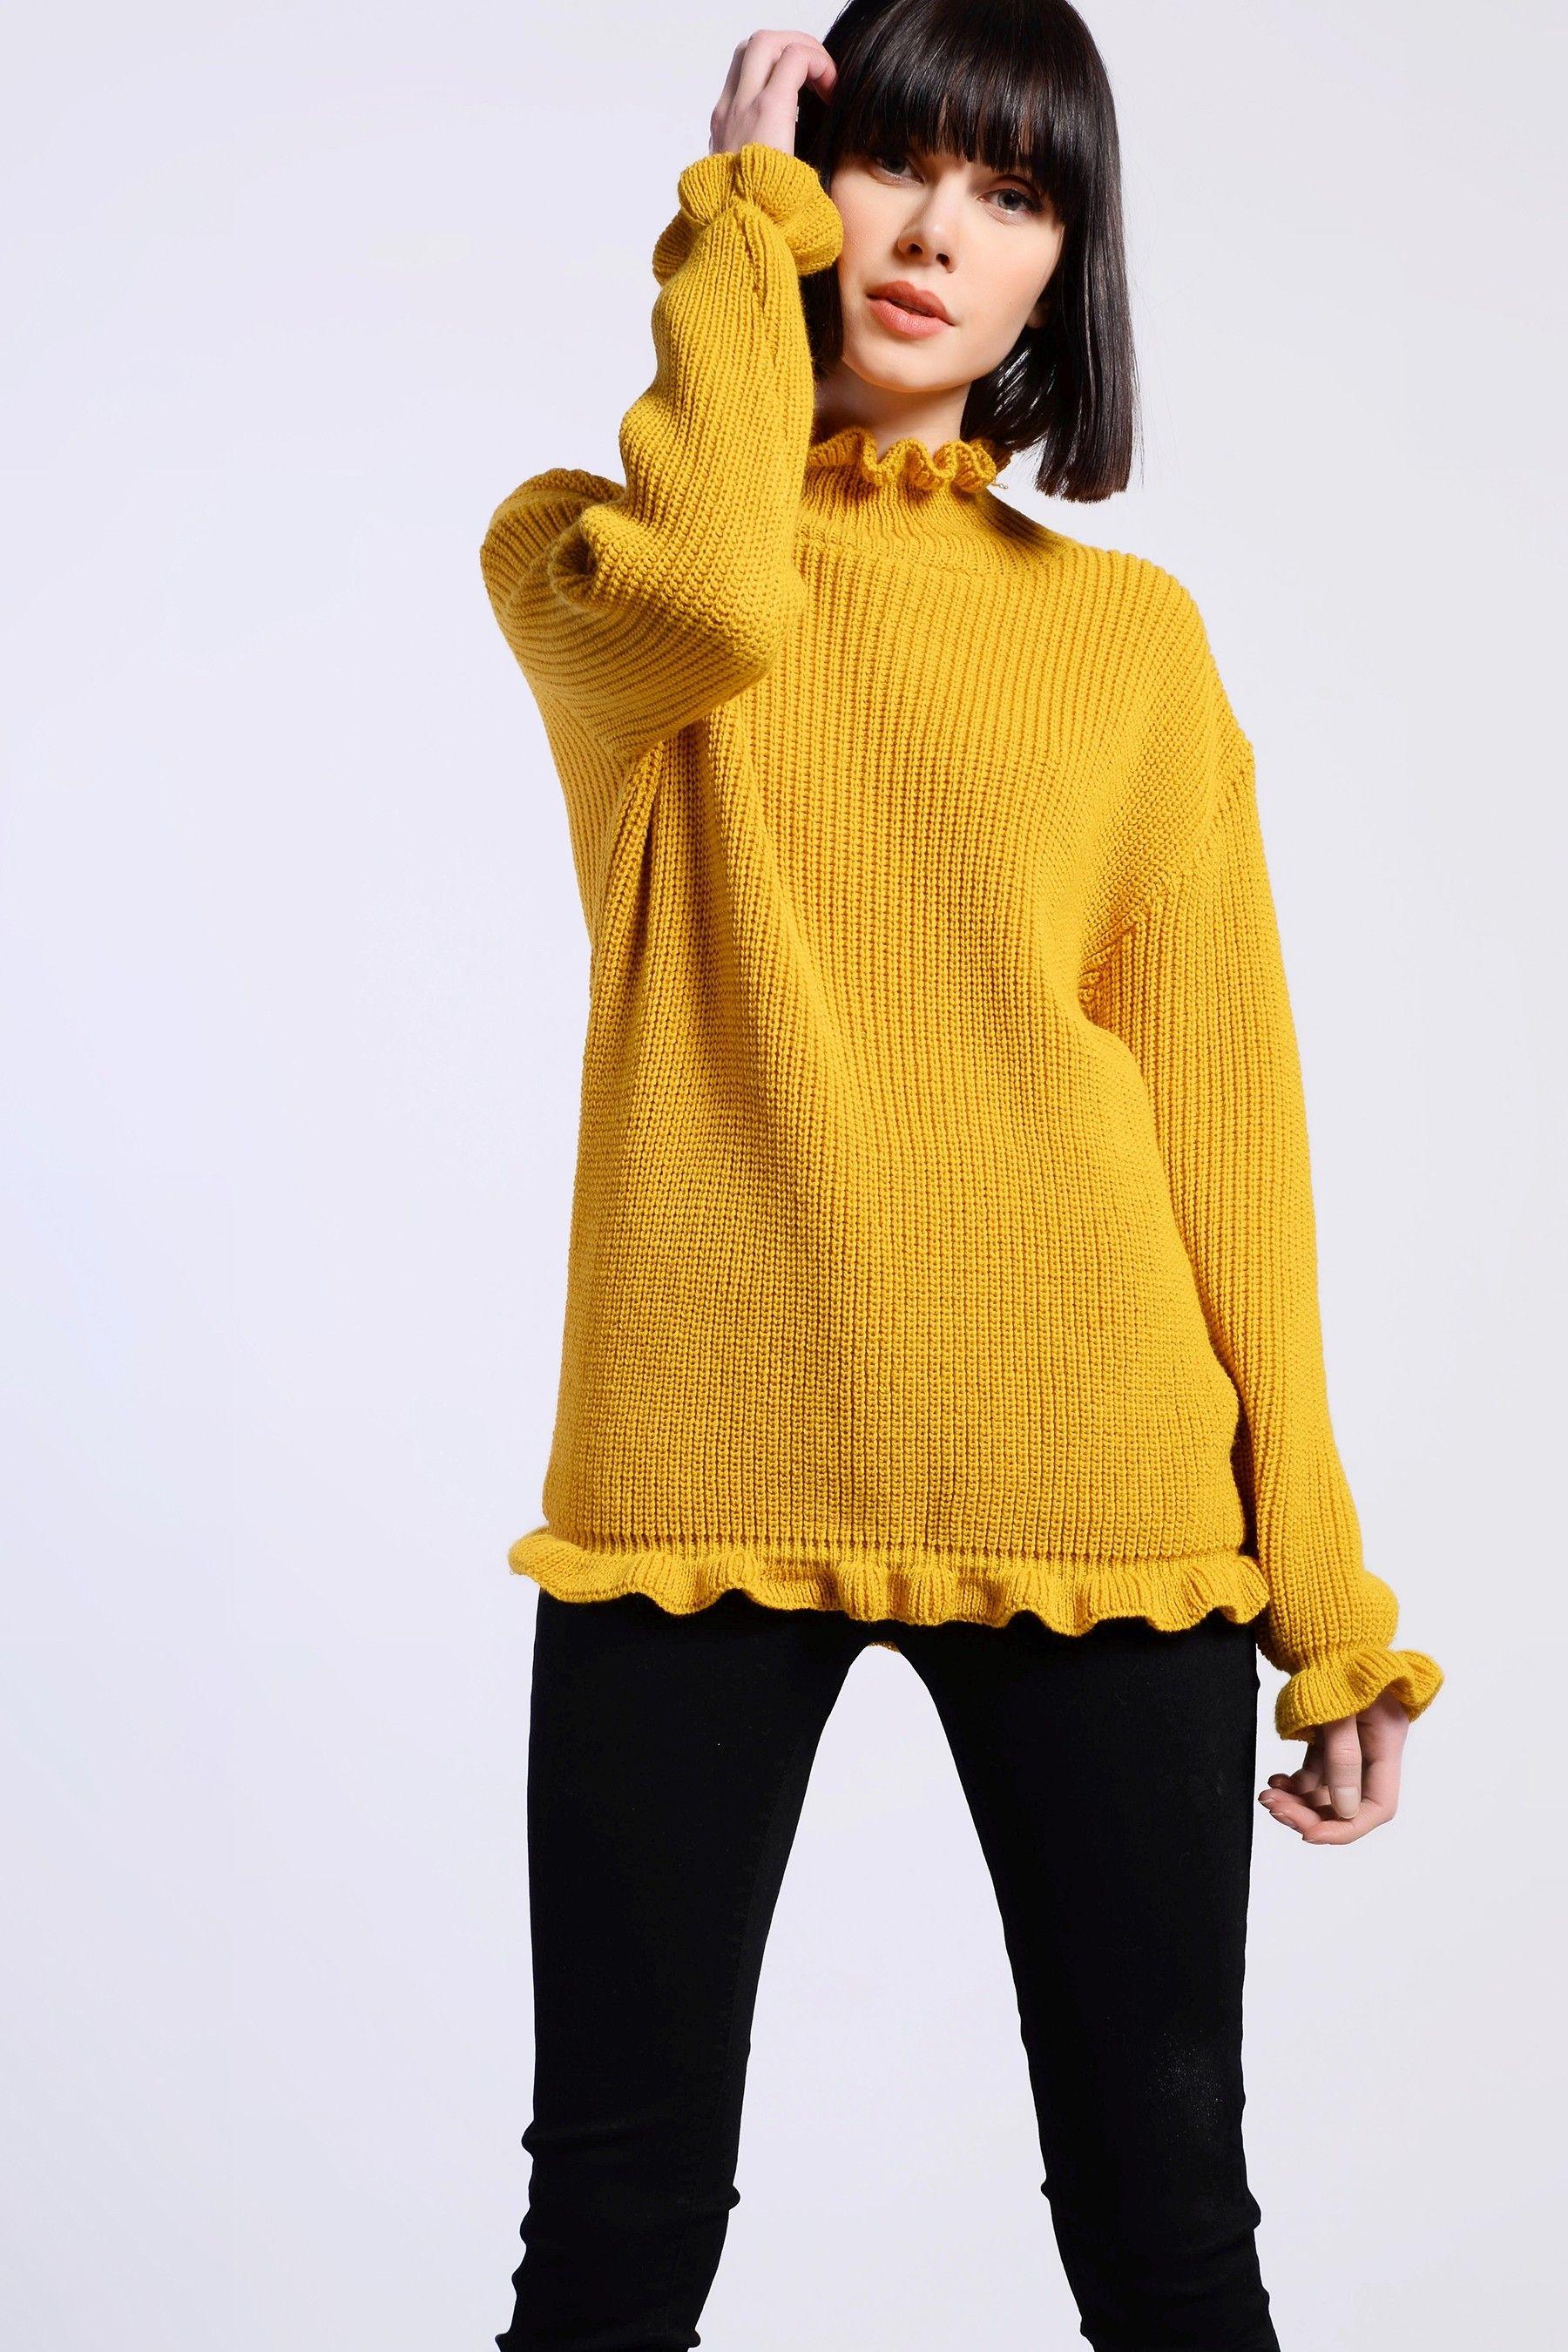 c7b2f233327793 Womens Glamorous Frill Hem Knitted Jumper - Yellow No Frills, Uk Online,  Mustard,